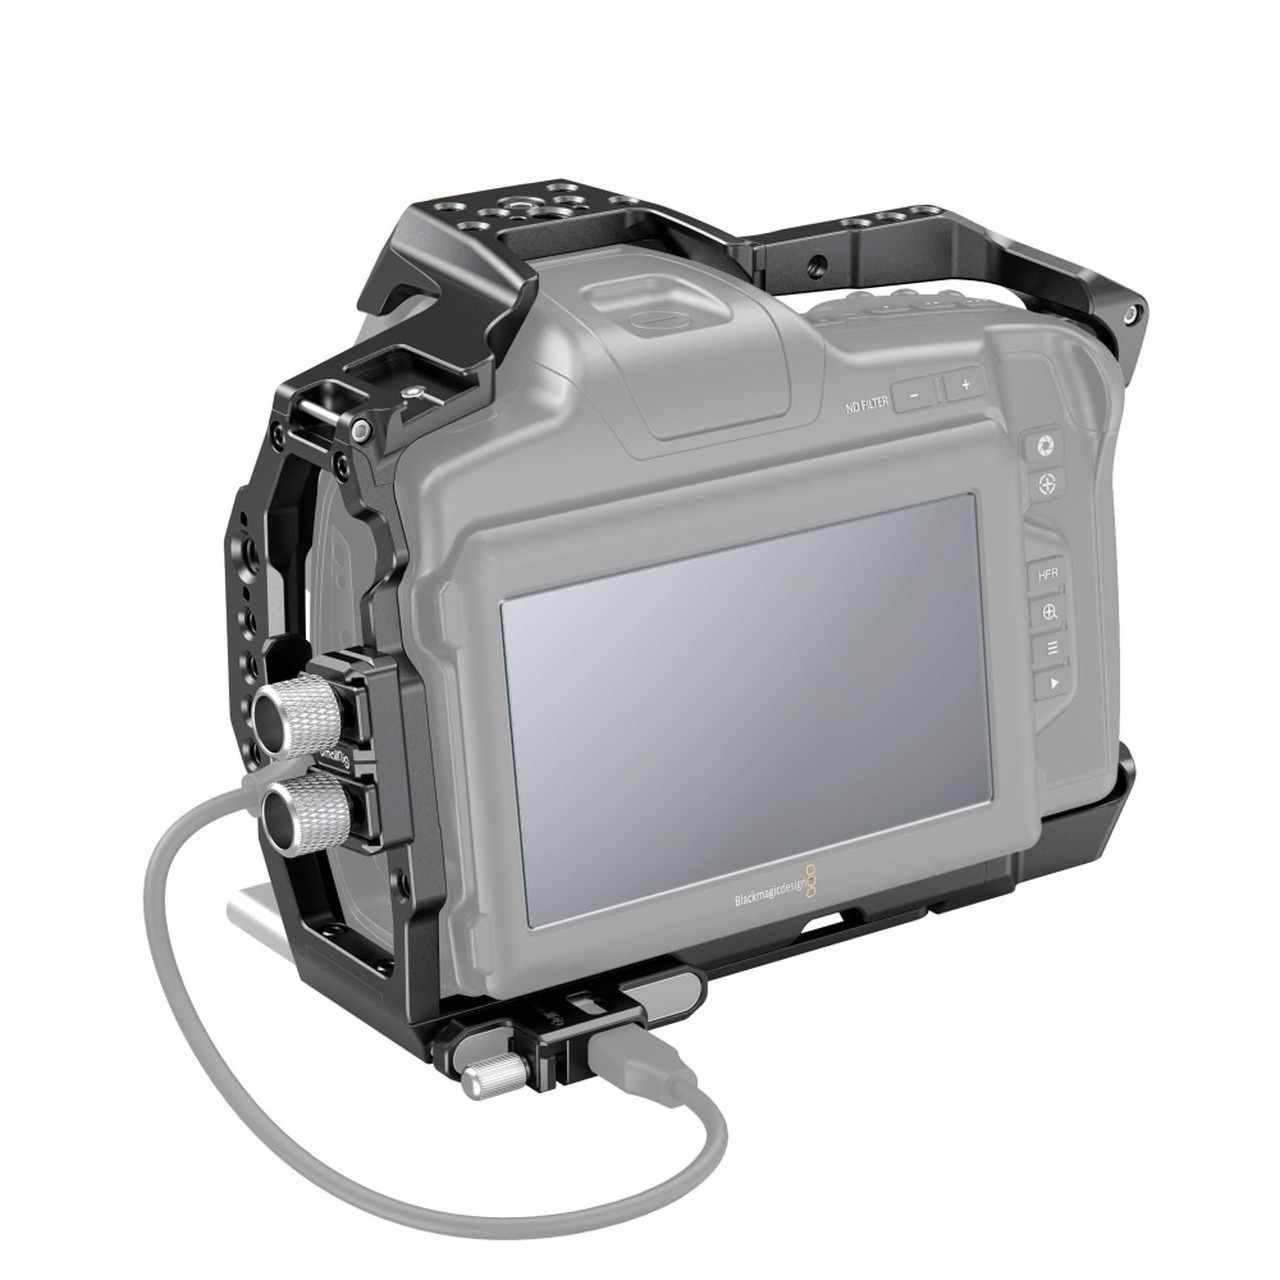 SmallRig 3298 Standard Accessory Kit BMPCC 6K PRO - klatka operatorska z akcesoriami do Blackmagic Pocket 6K Pro